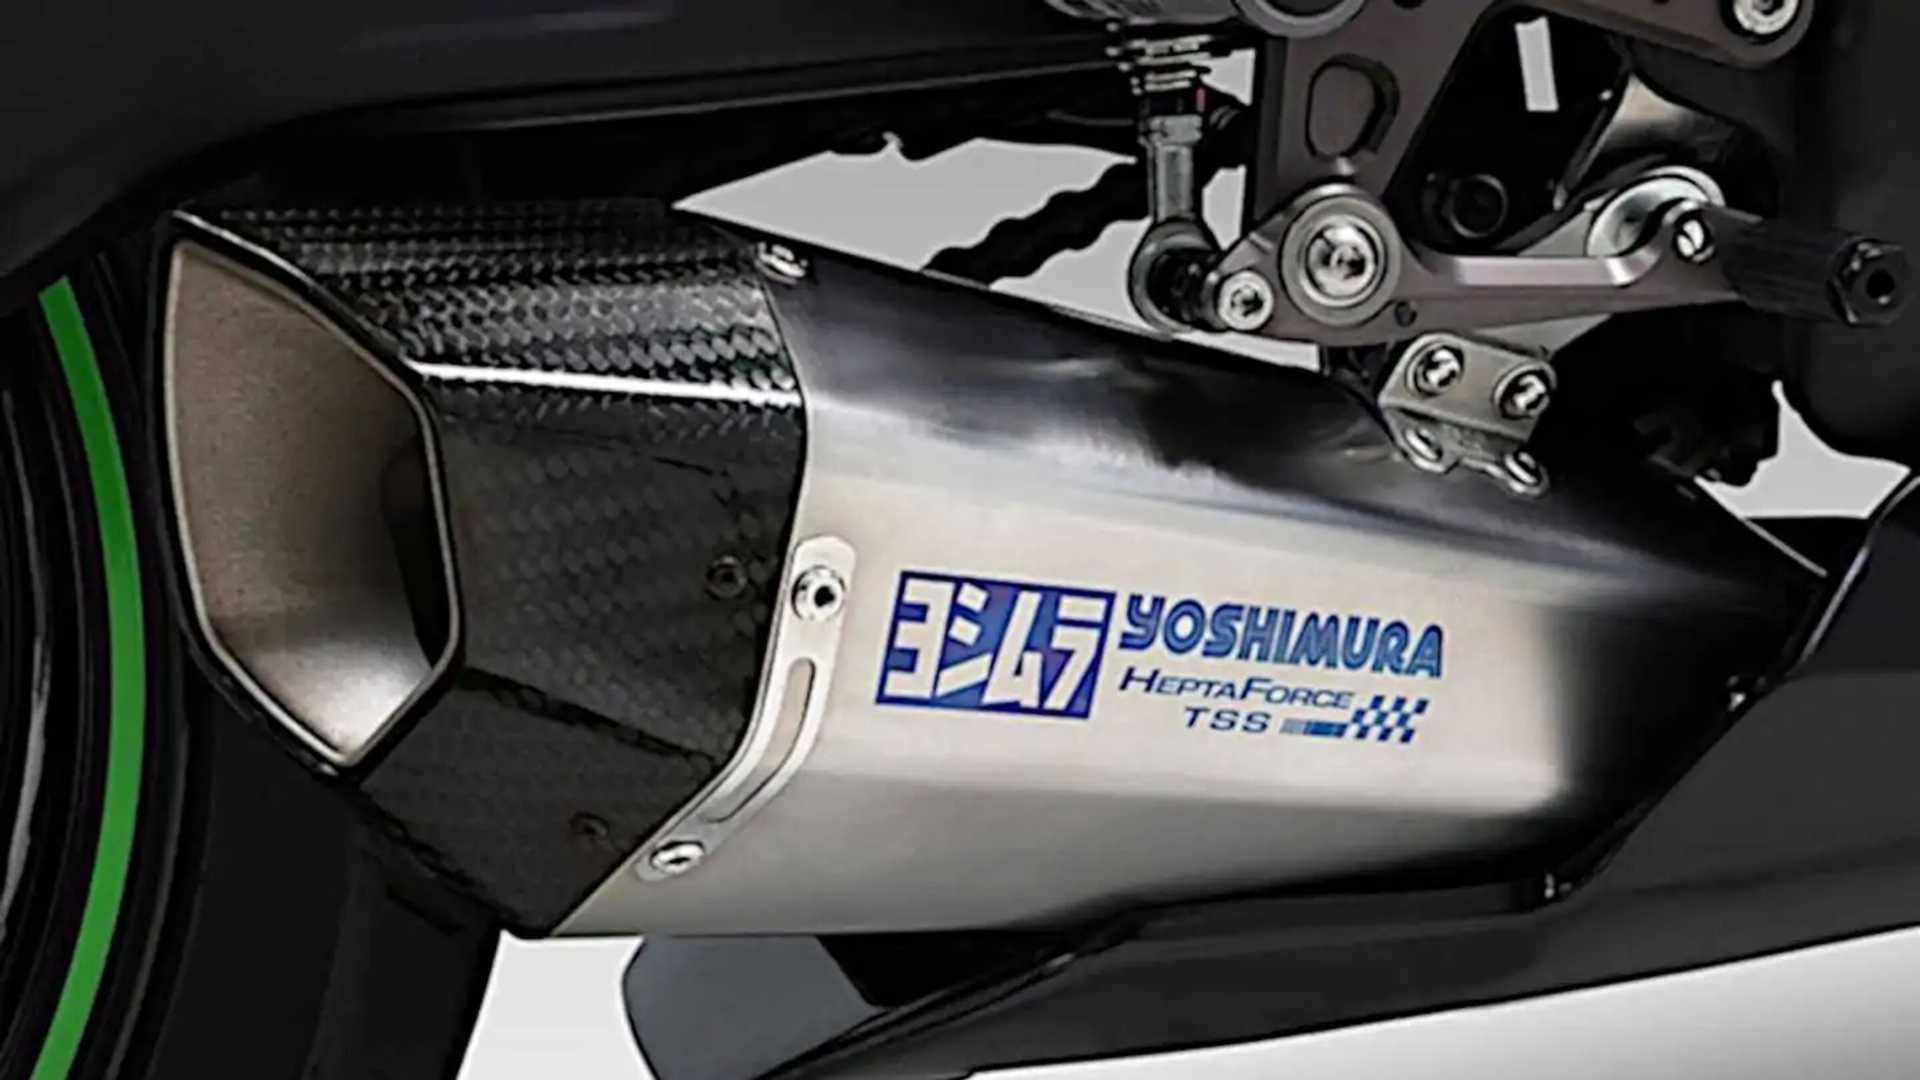 Yoshimura Hepta Force TSS Exhaust for Kawasaki ZX-25R - Stainless Steel Silencer